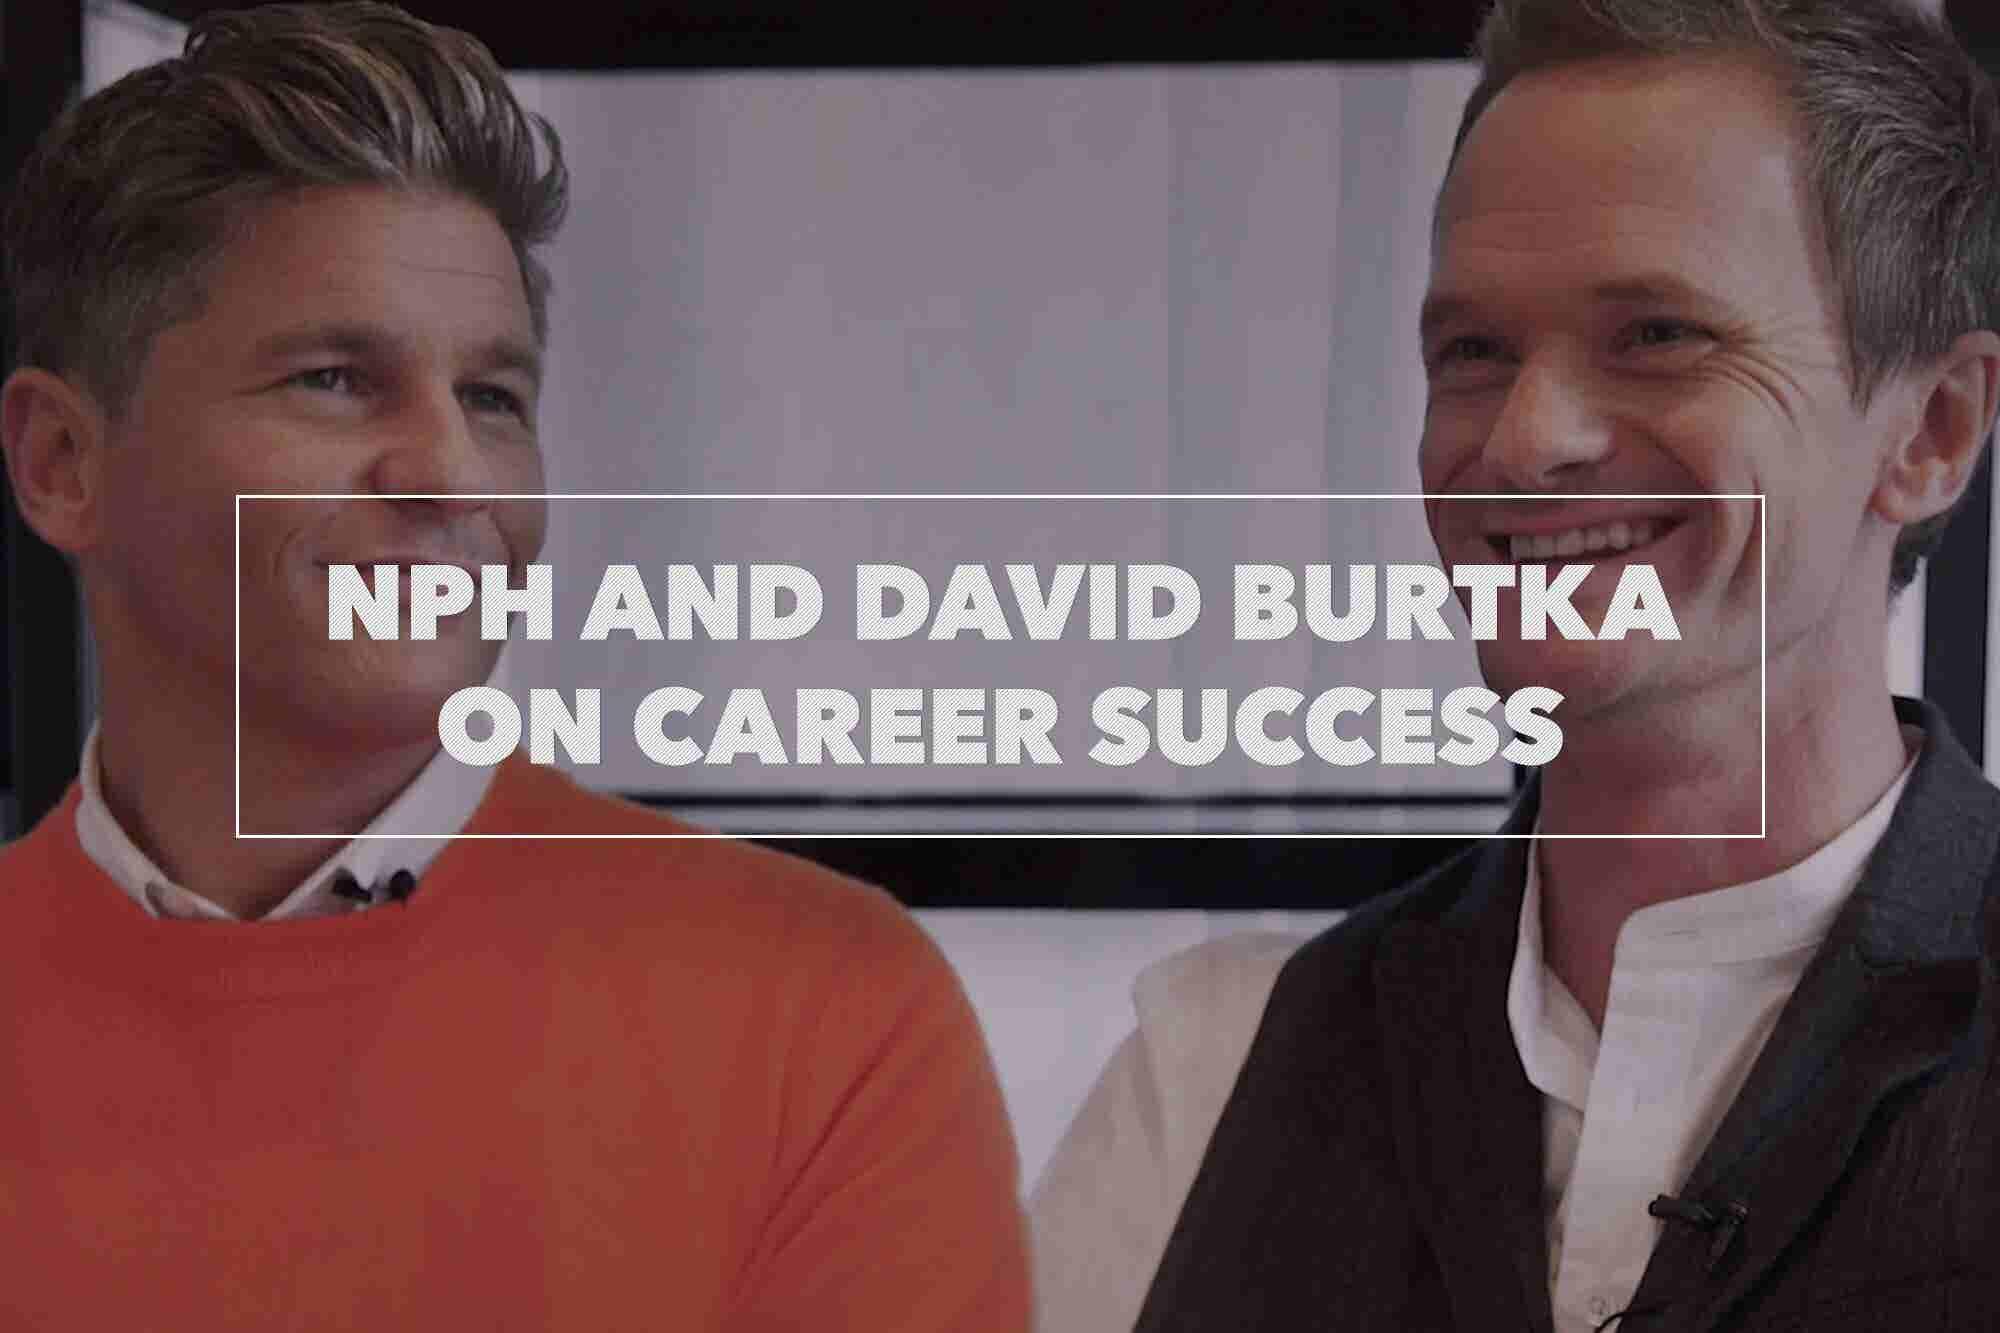 Neil Patrick Harris and David Burtka Reveal Top Tips for Car...